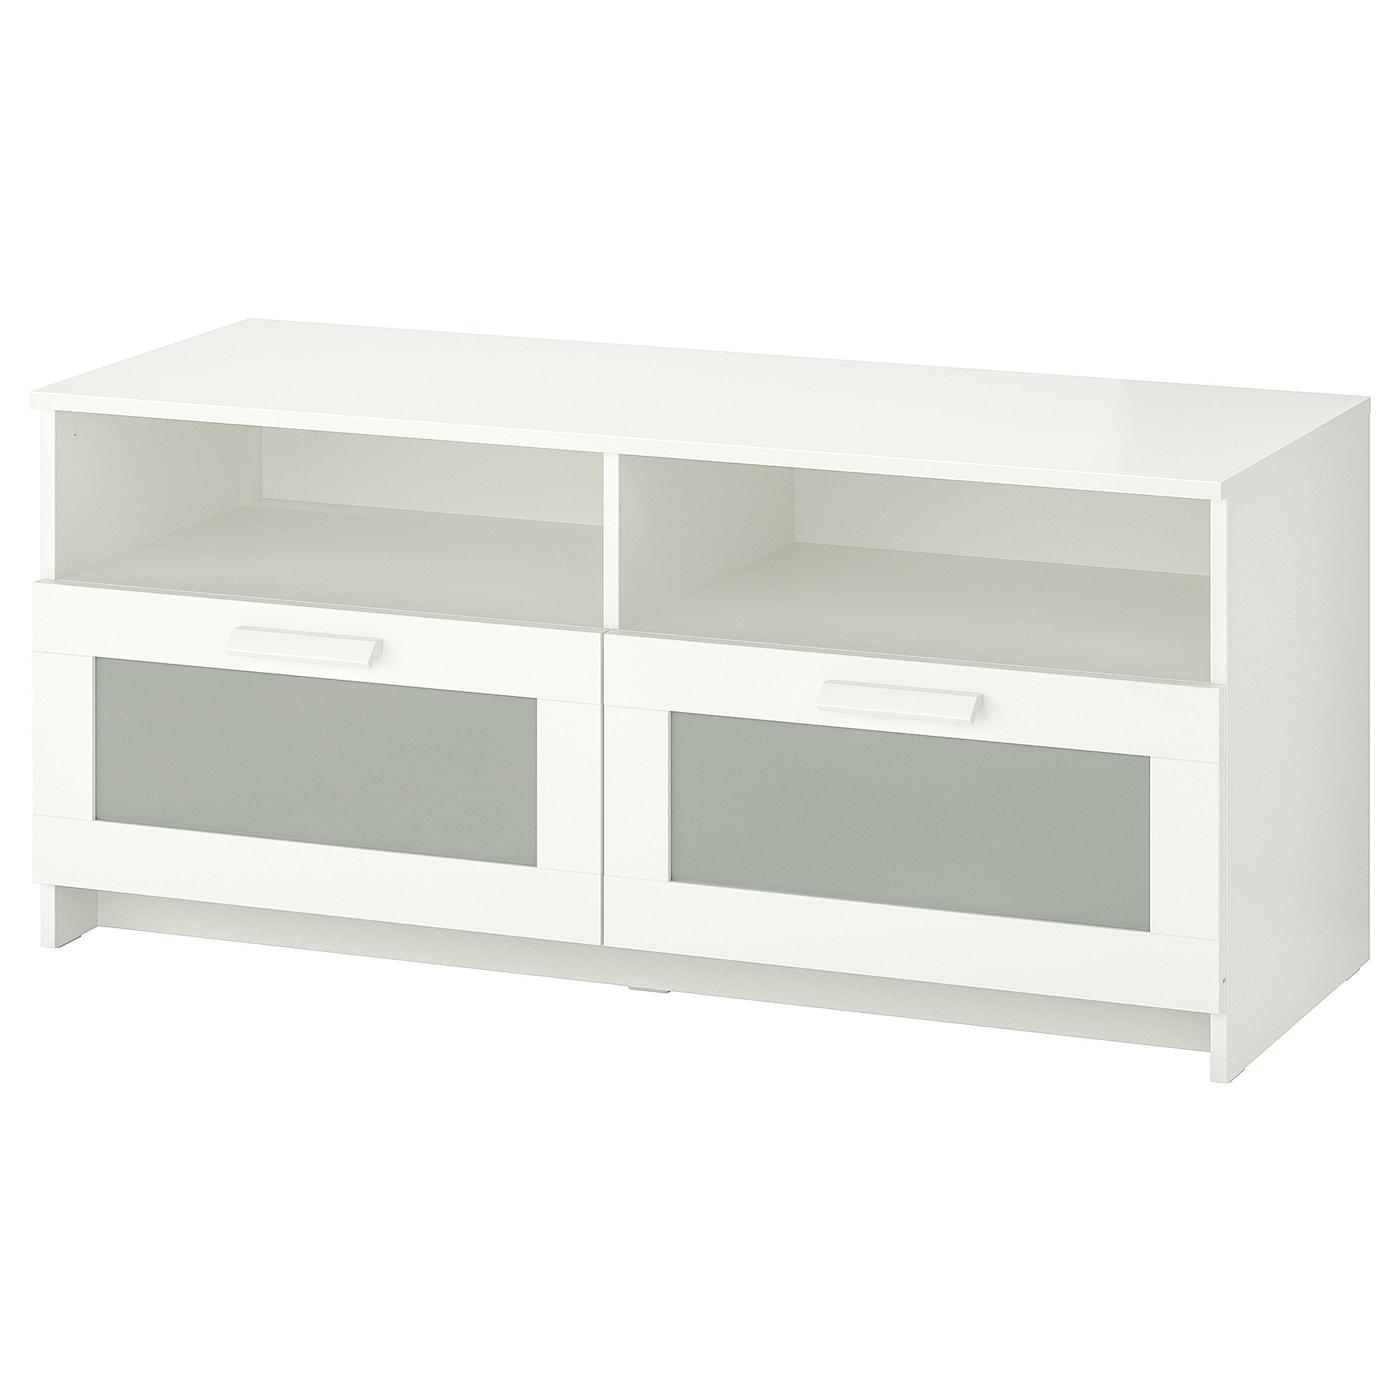 Brimnes Tv Bench White 120x41x53 Cm Ikea